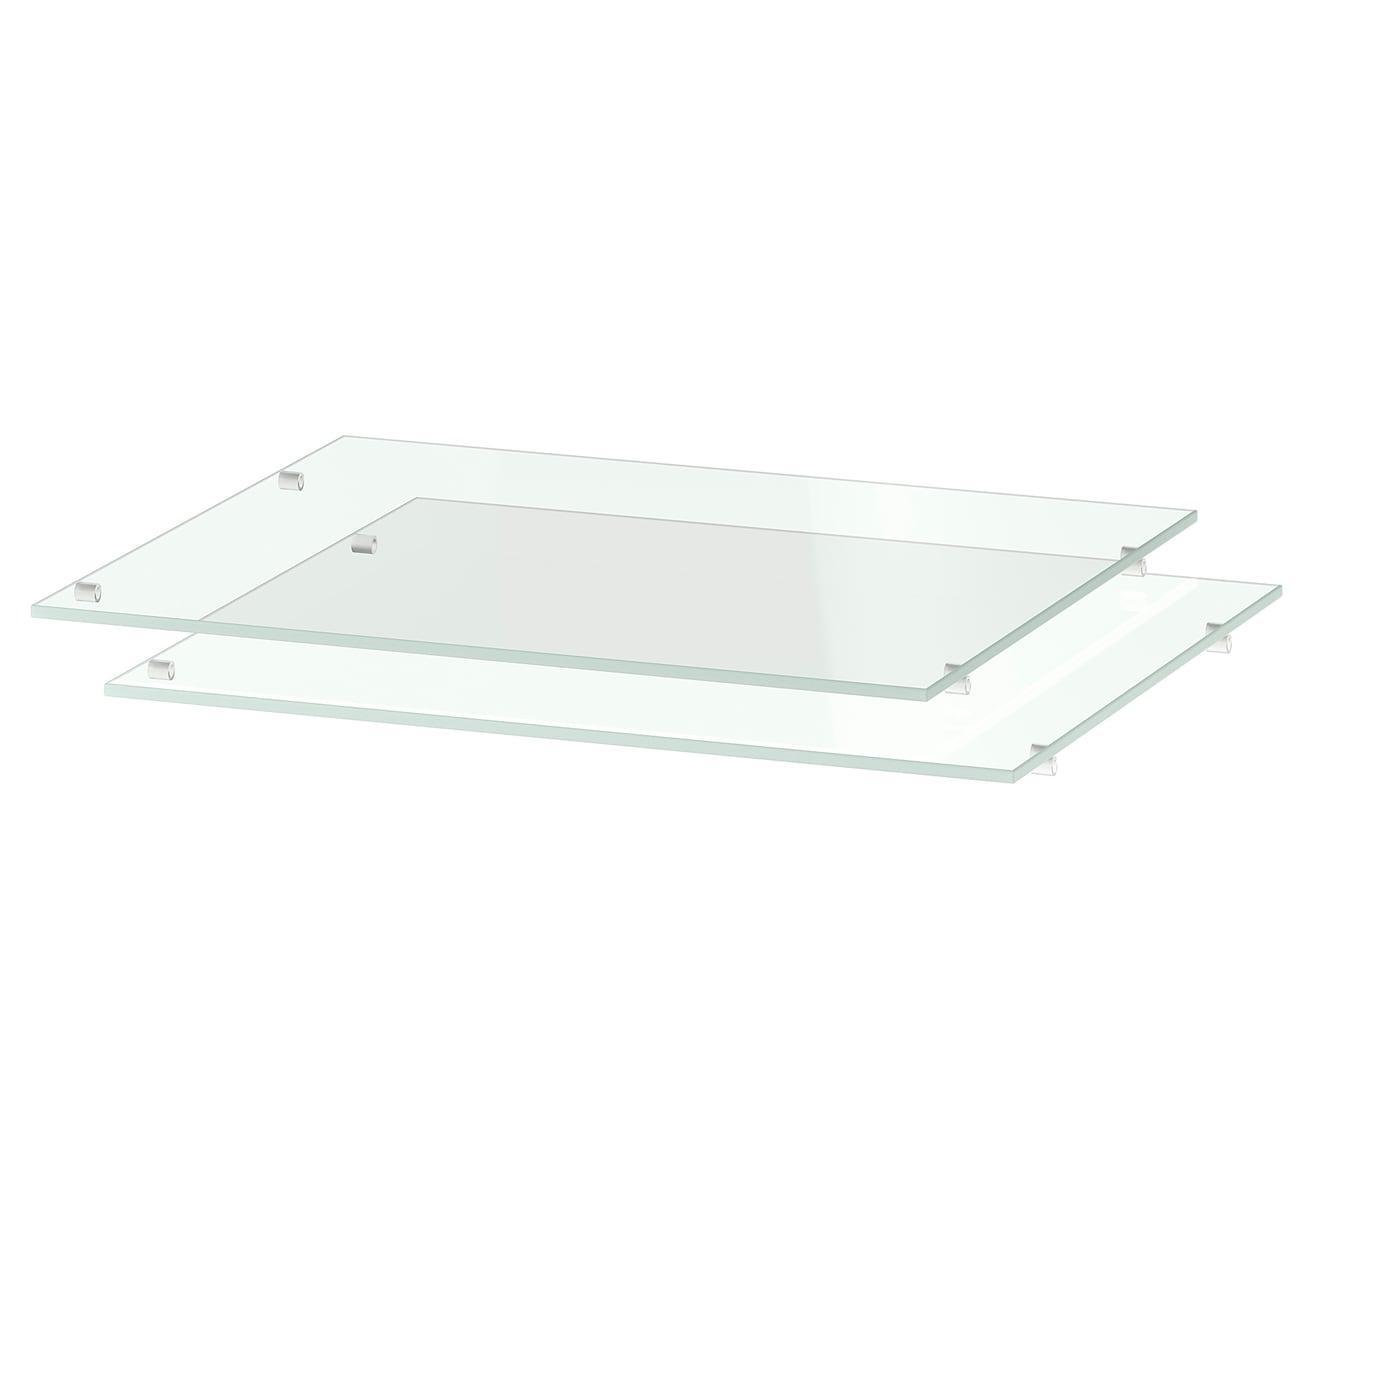 utrusta tablette verre 40 x 37 cm ikea. Black Bedroom Furniture Sets. Home Design Ideas